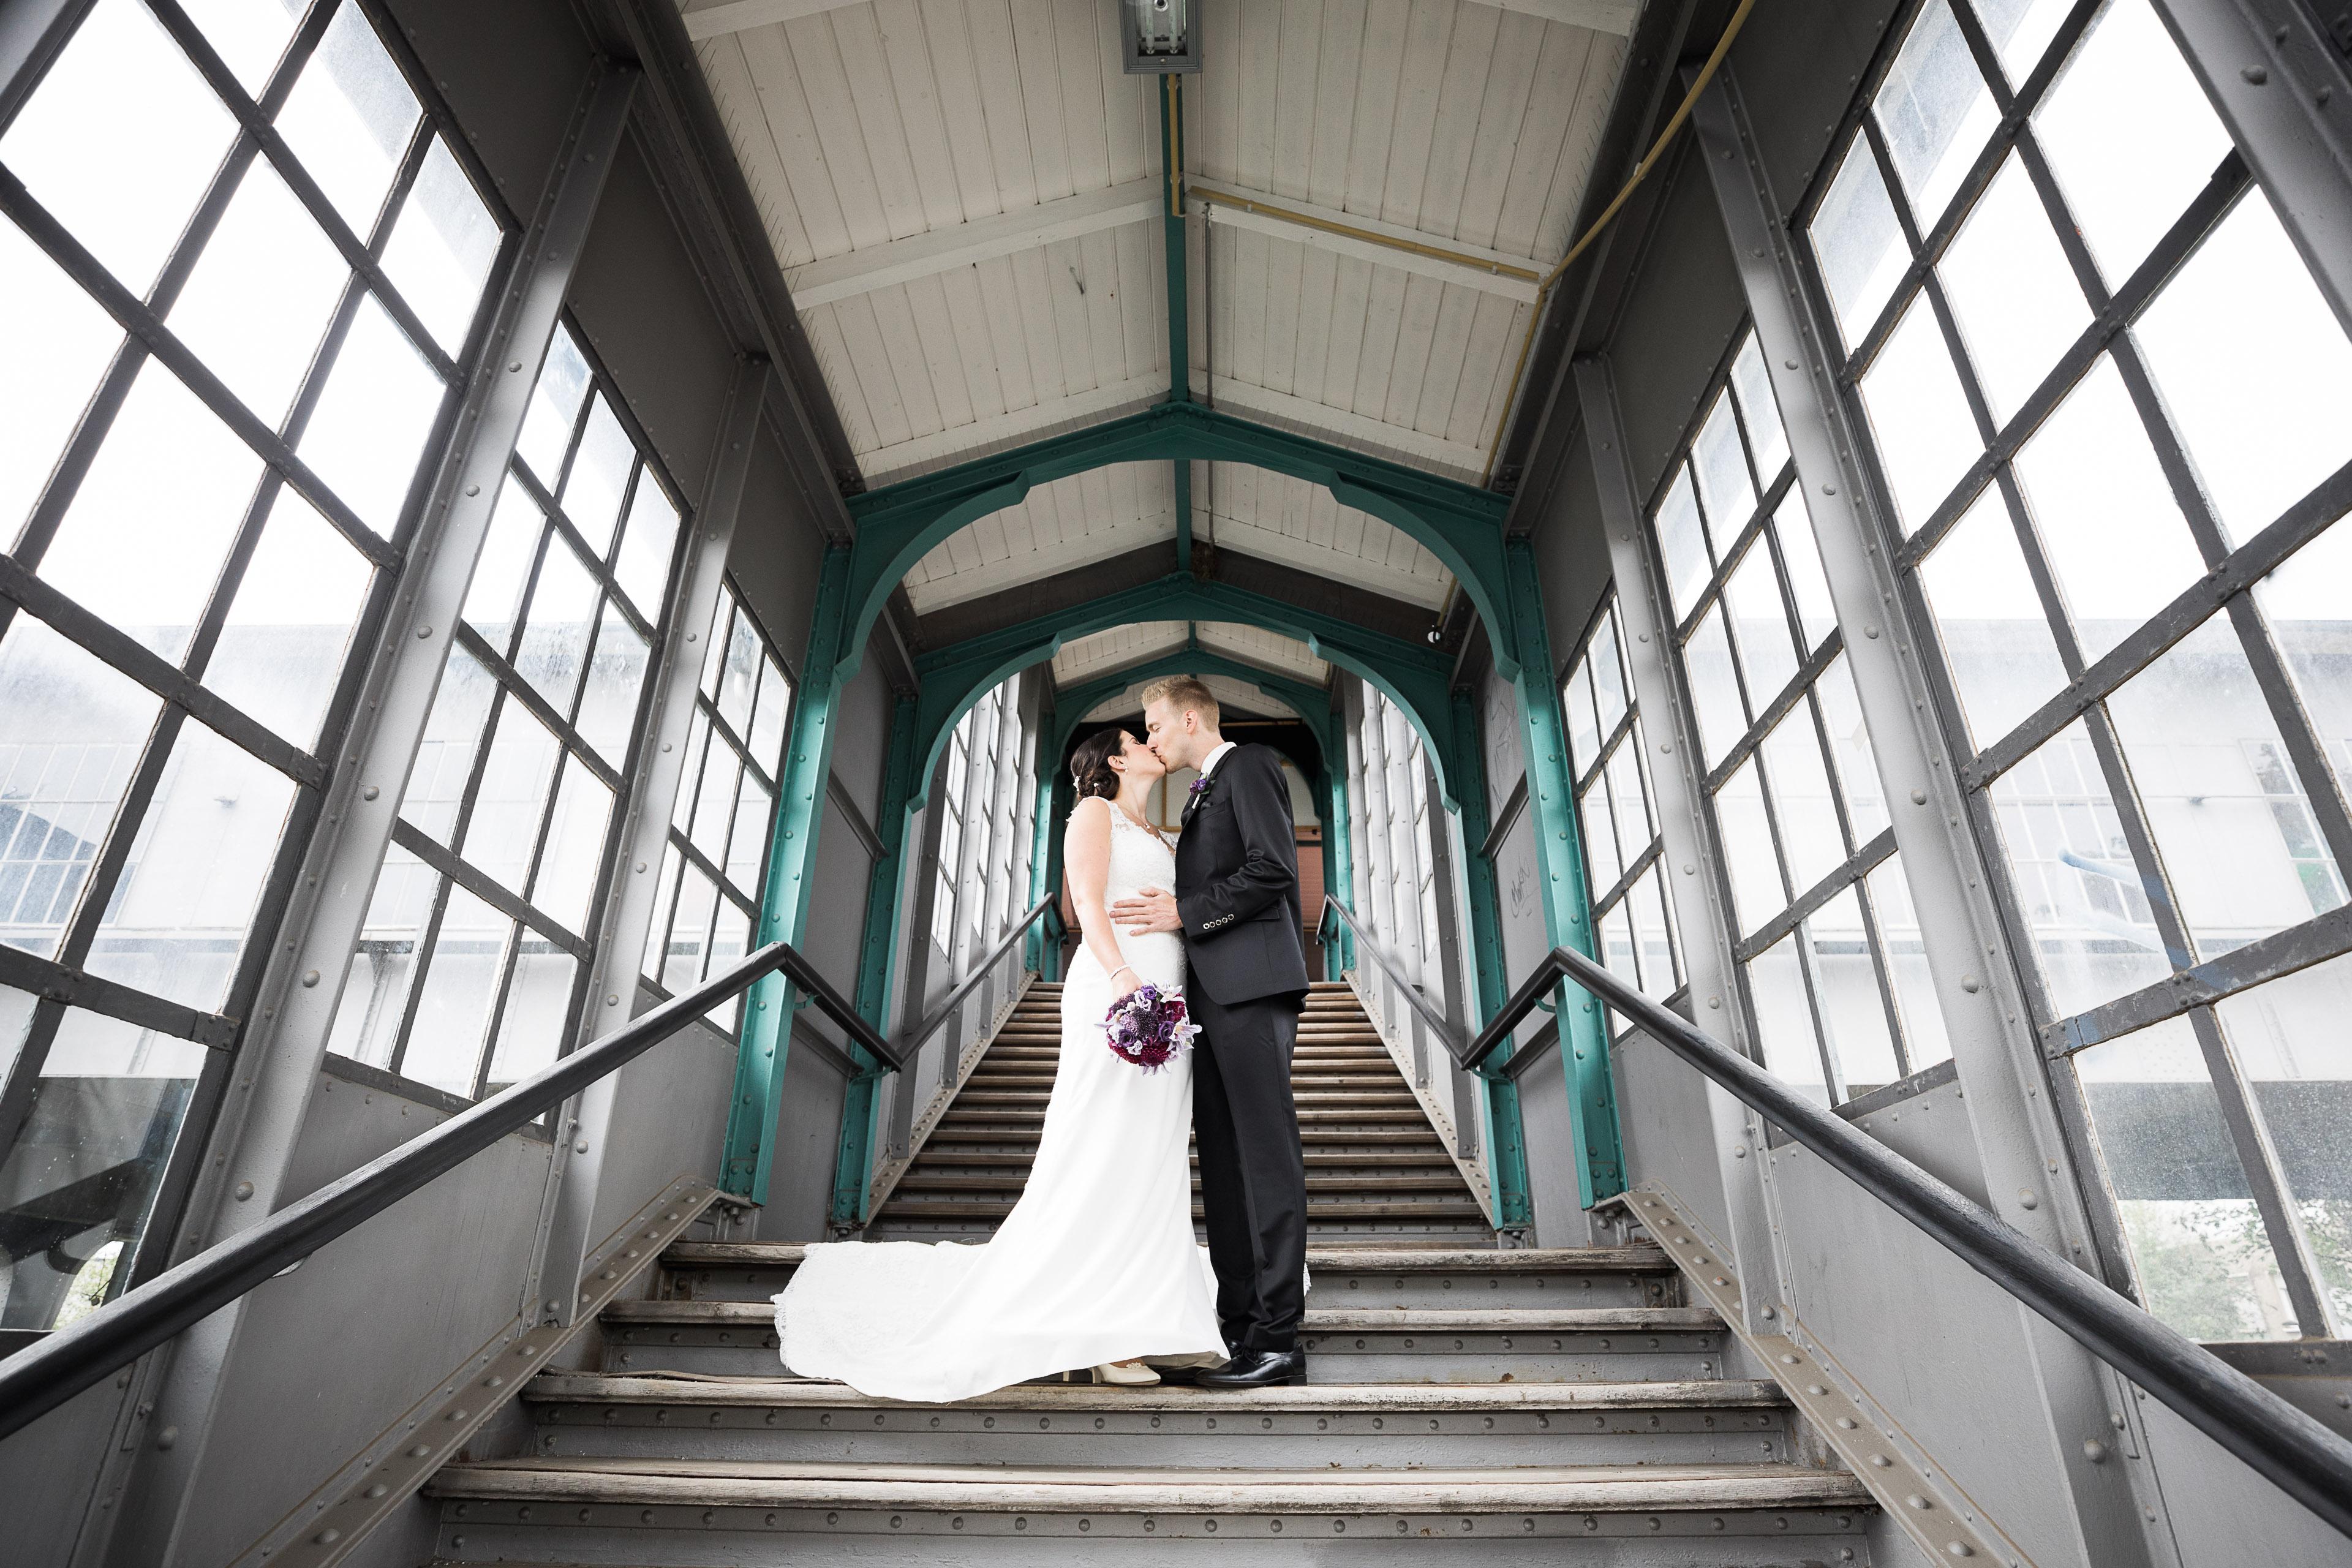 sj018 hochzeit fotograf solingen steinhaus marcus claudi photography